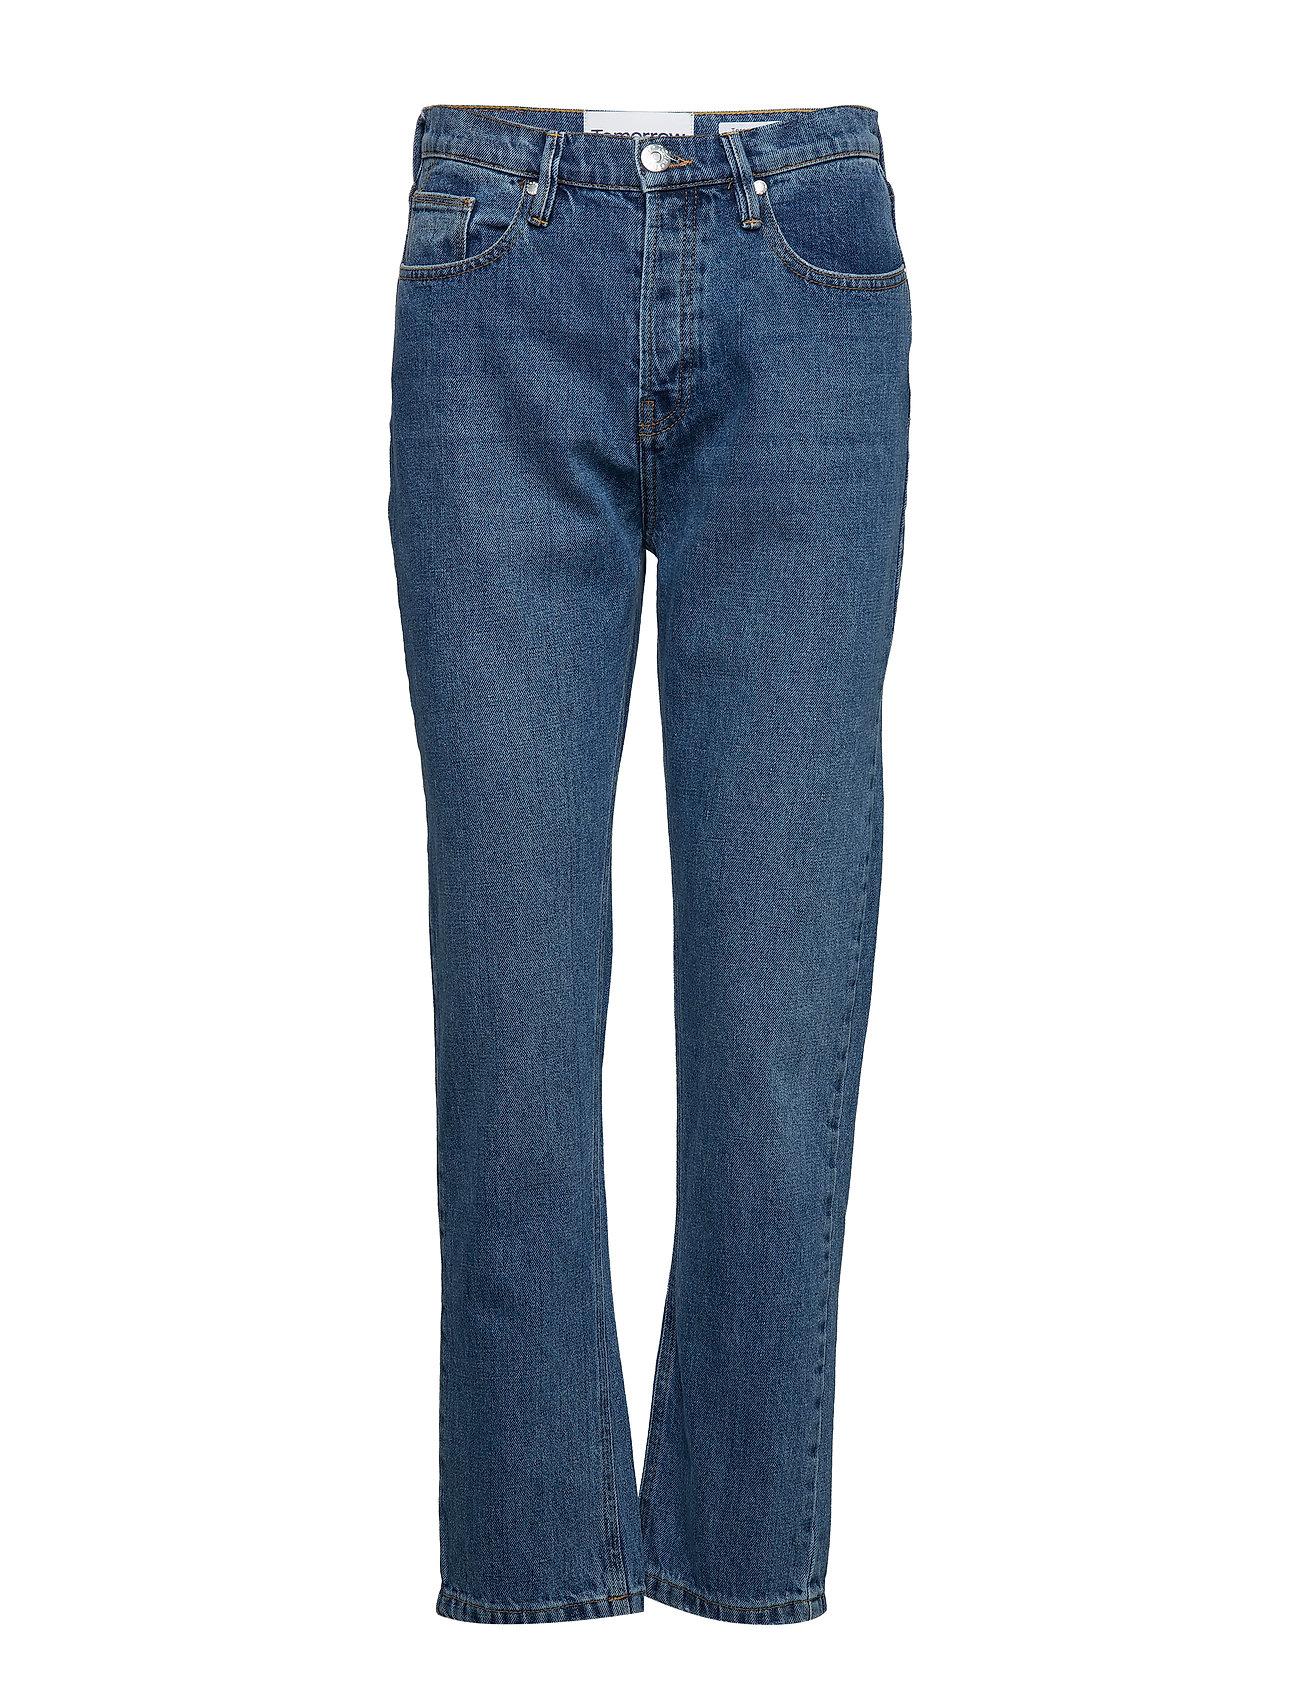 Teresa Orlandodenim Regular Bright Wash BlueTomorrow Jeans nkXN8P0wO